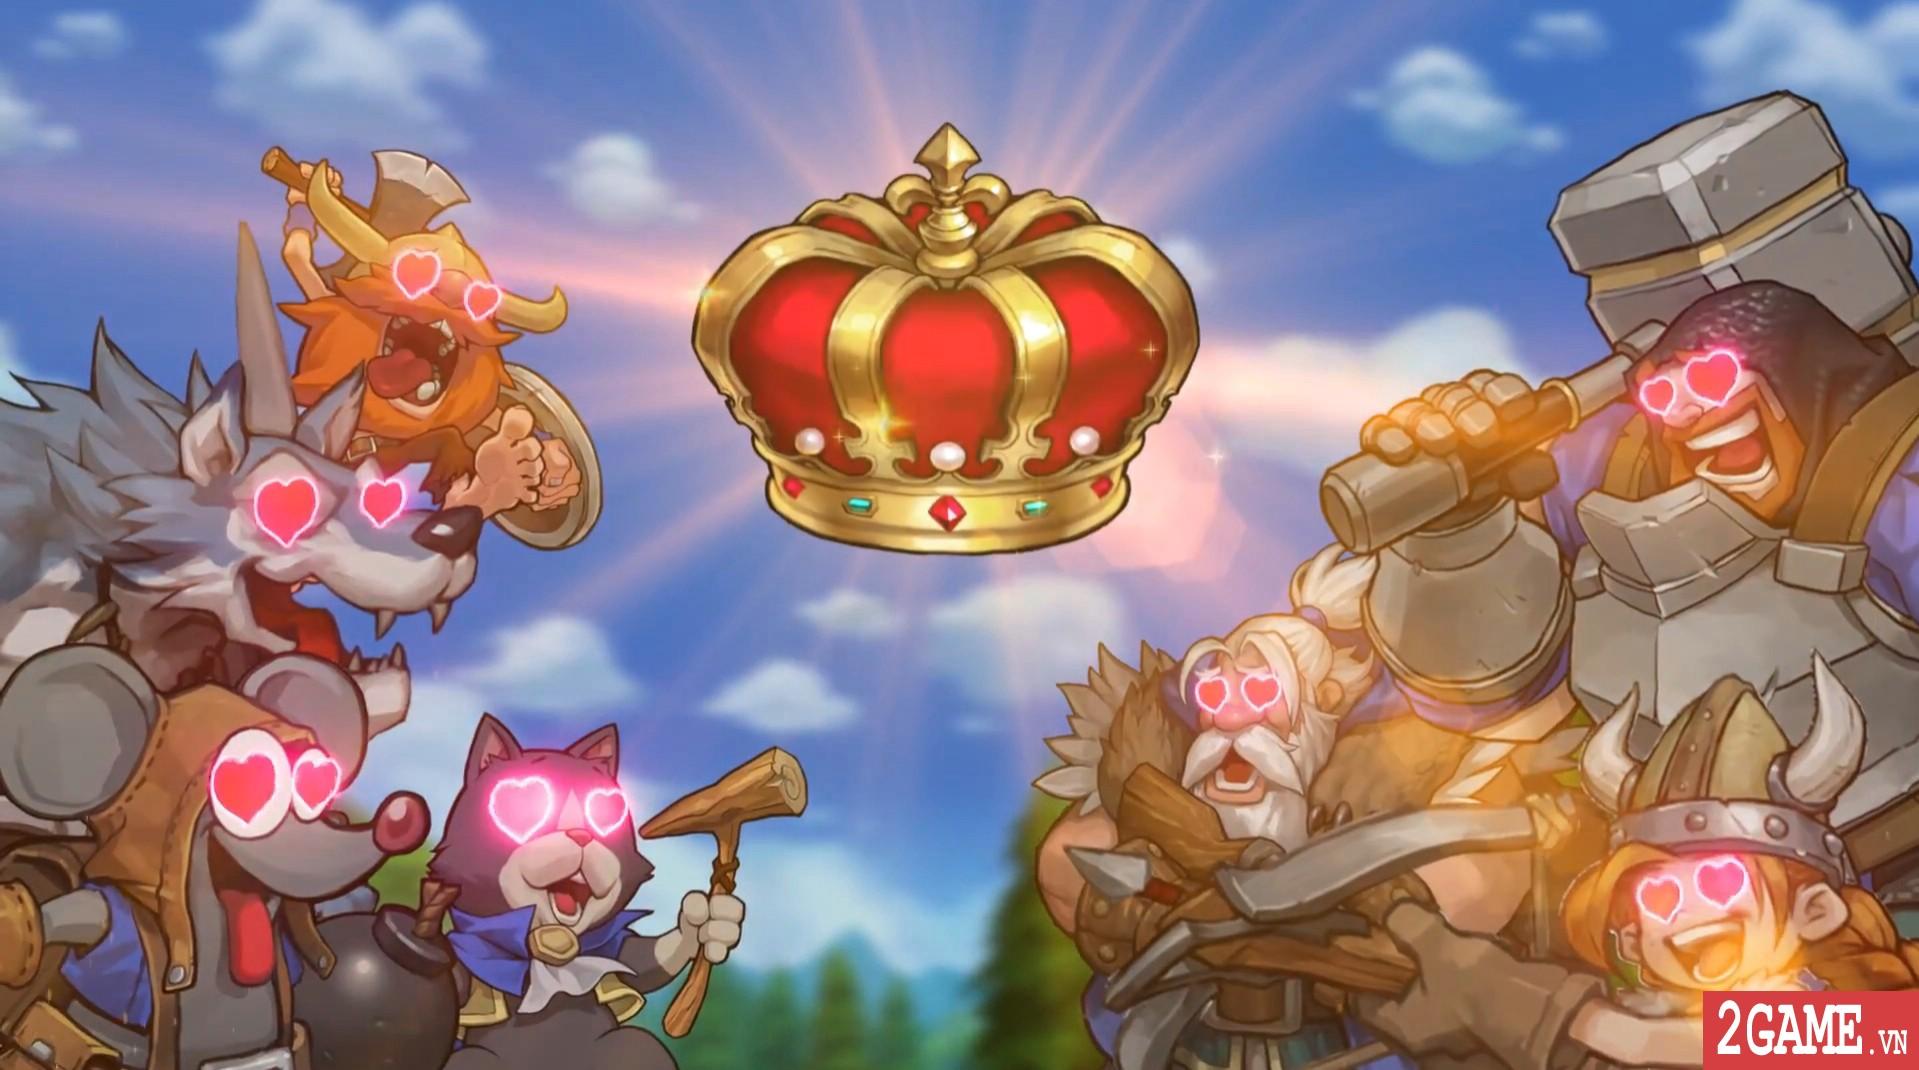 Castle Burn – Game phong cách Clash Royale đầy cuốn hút 4